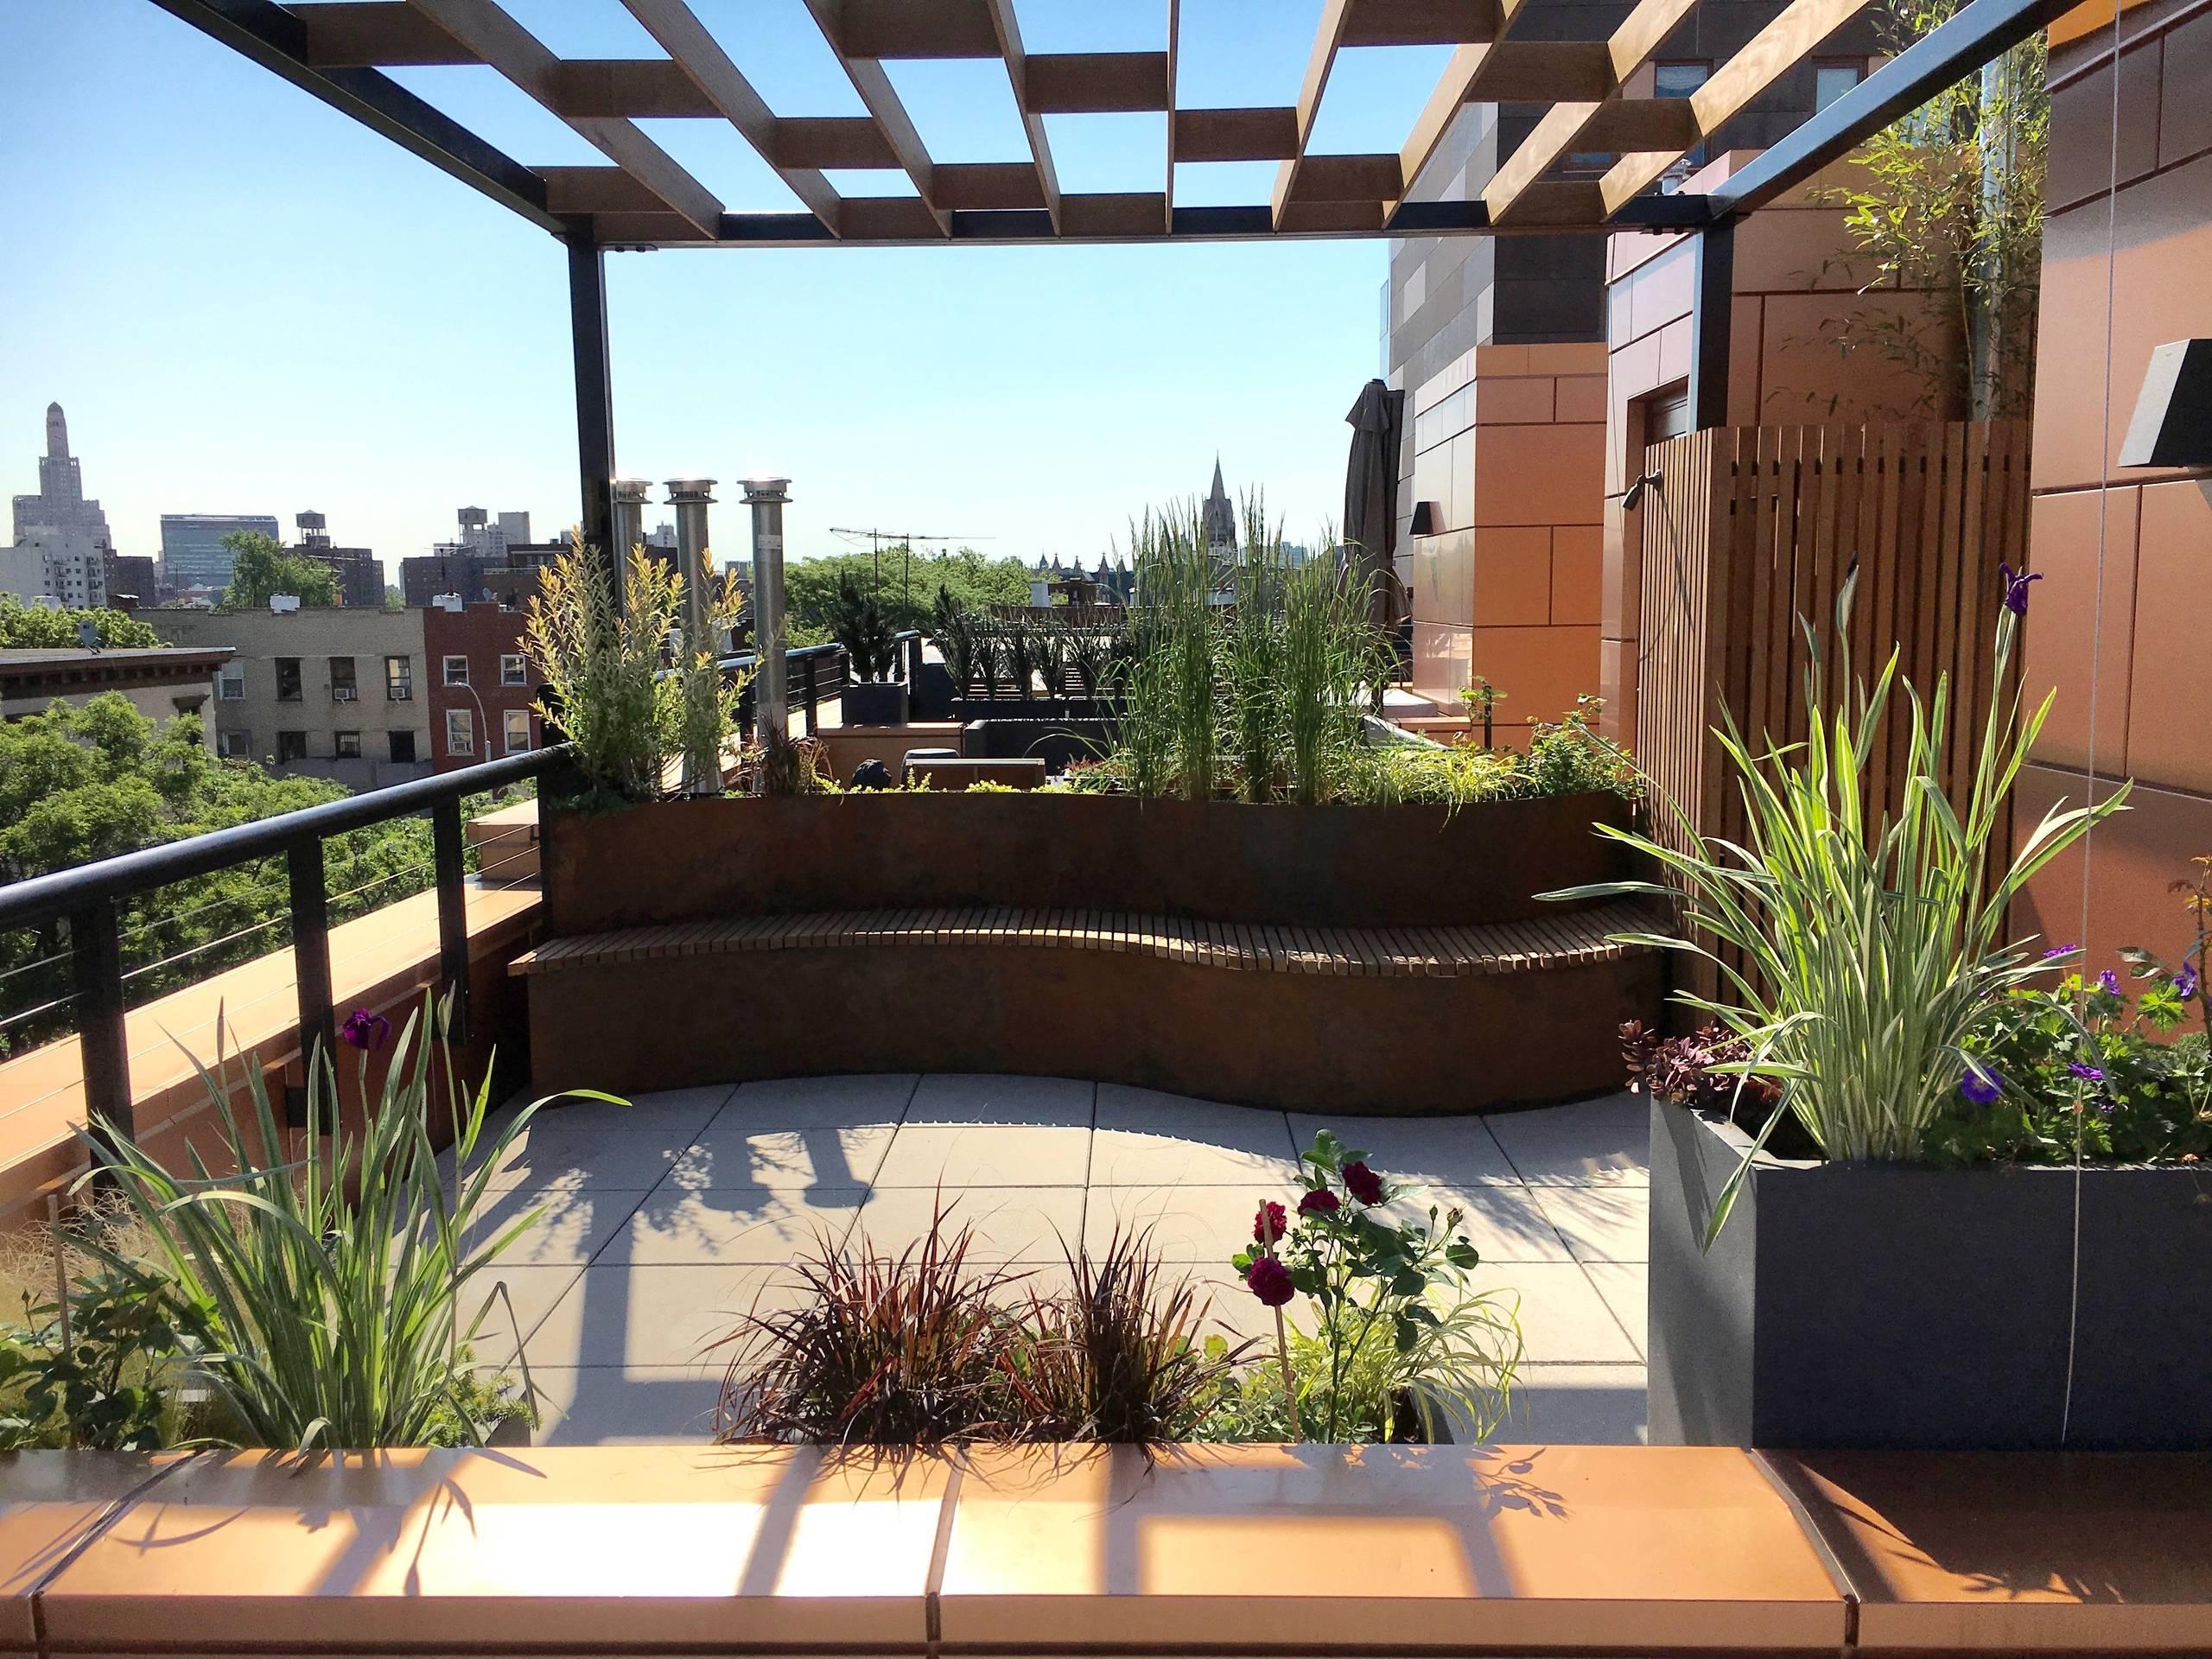 Brooklyn Rooftop Garden 6